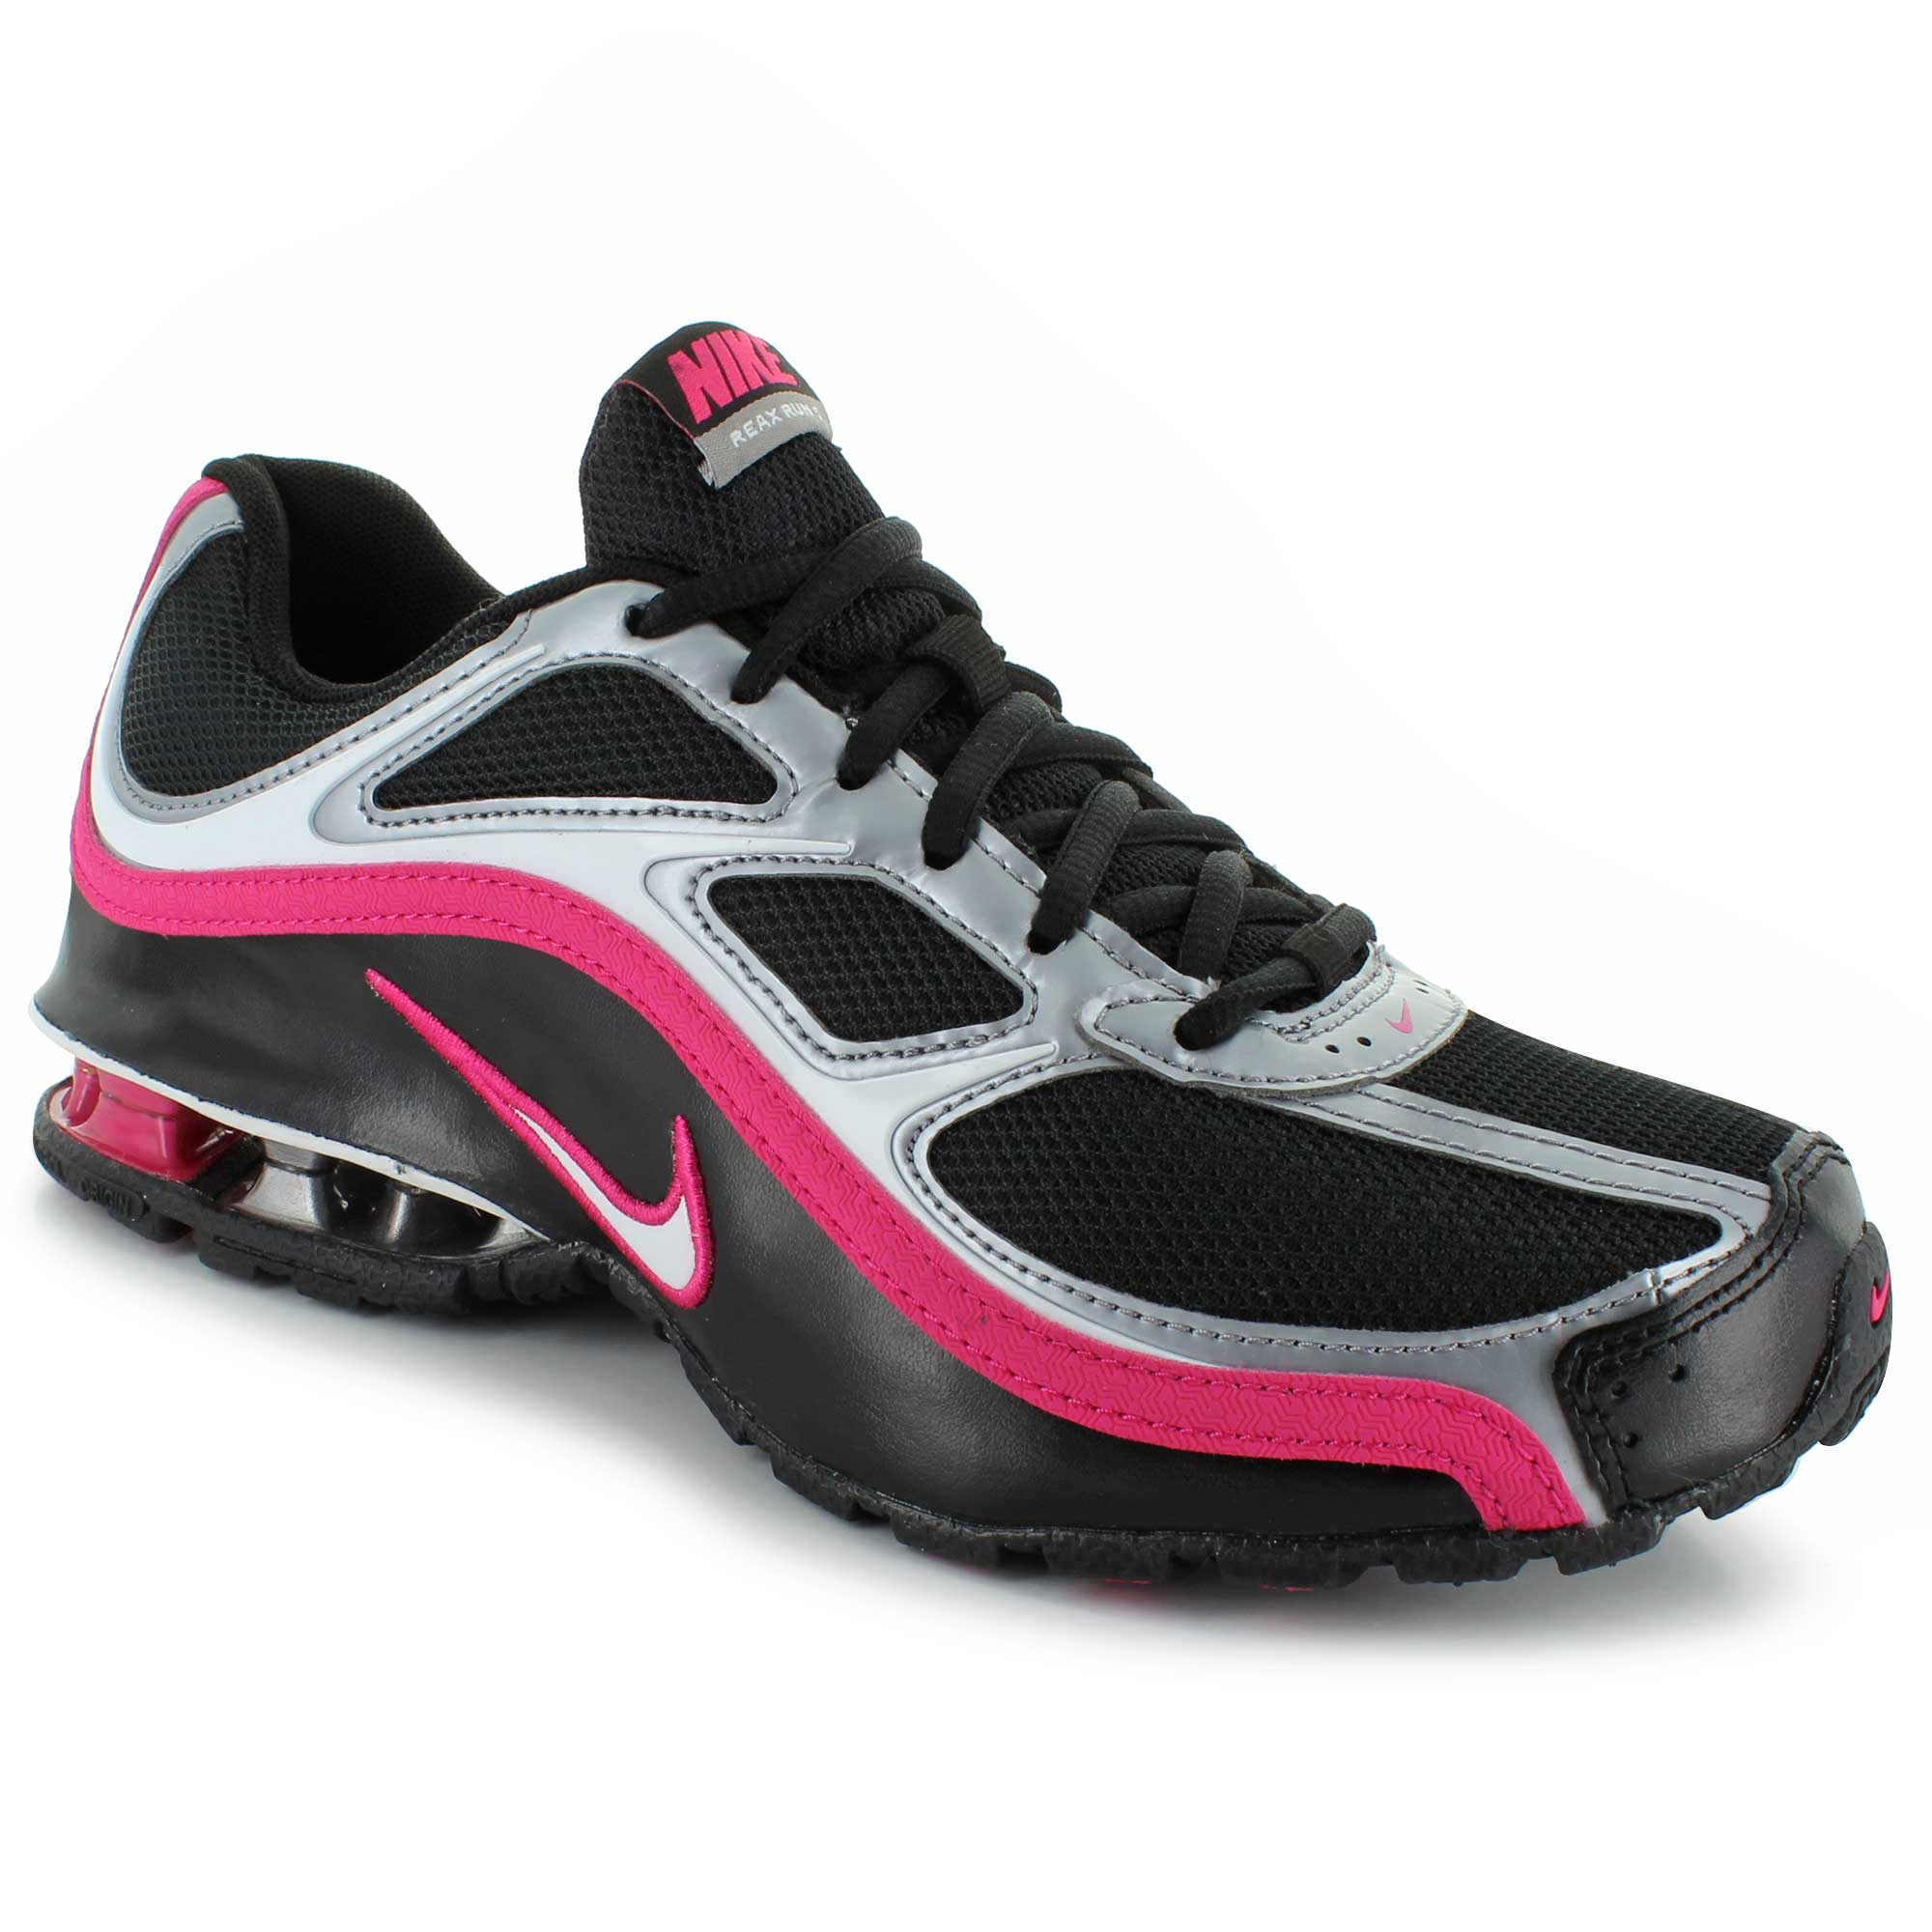 ca3eb2ab7 Nike Reax Run 5